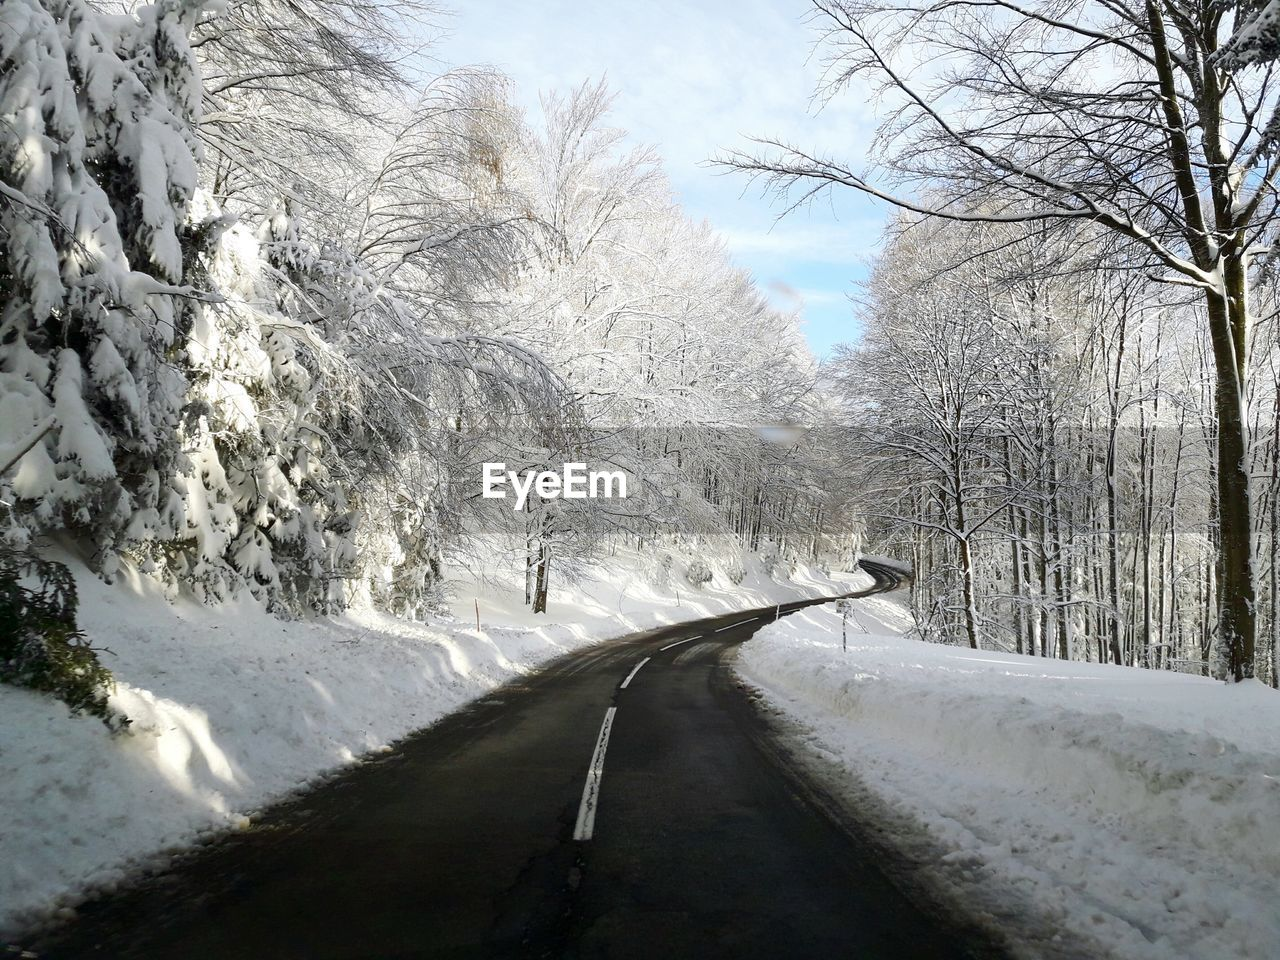 Road Along Trees In Winter